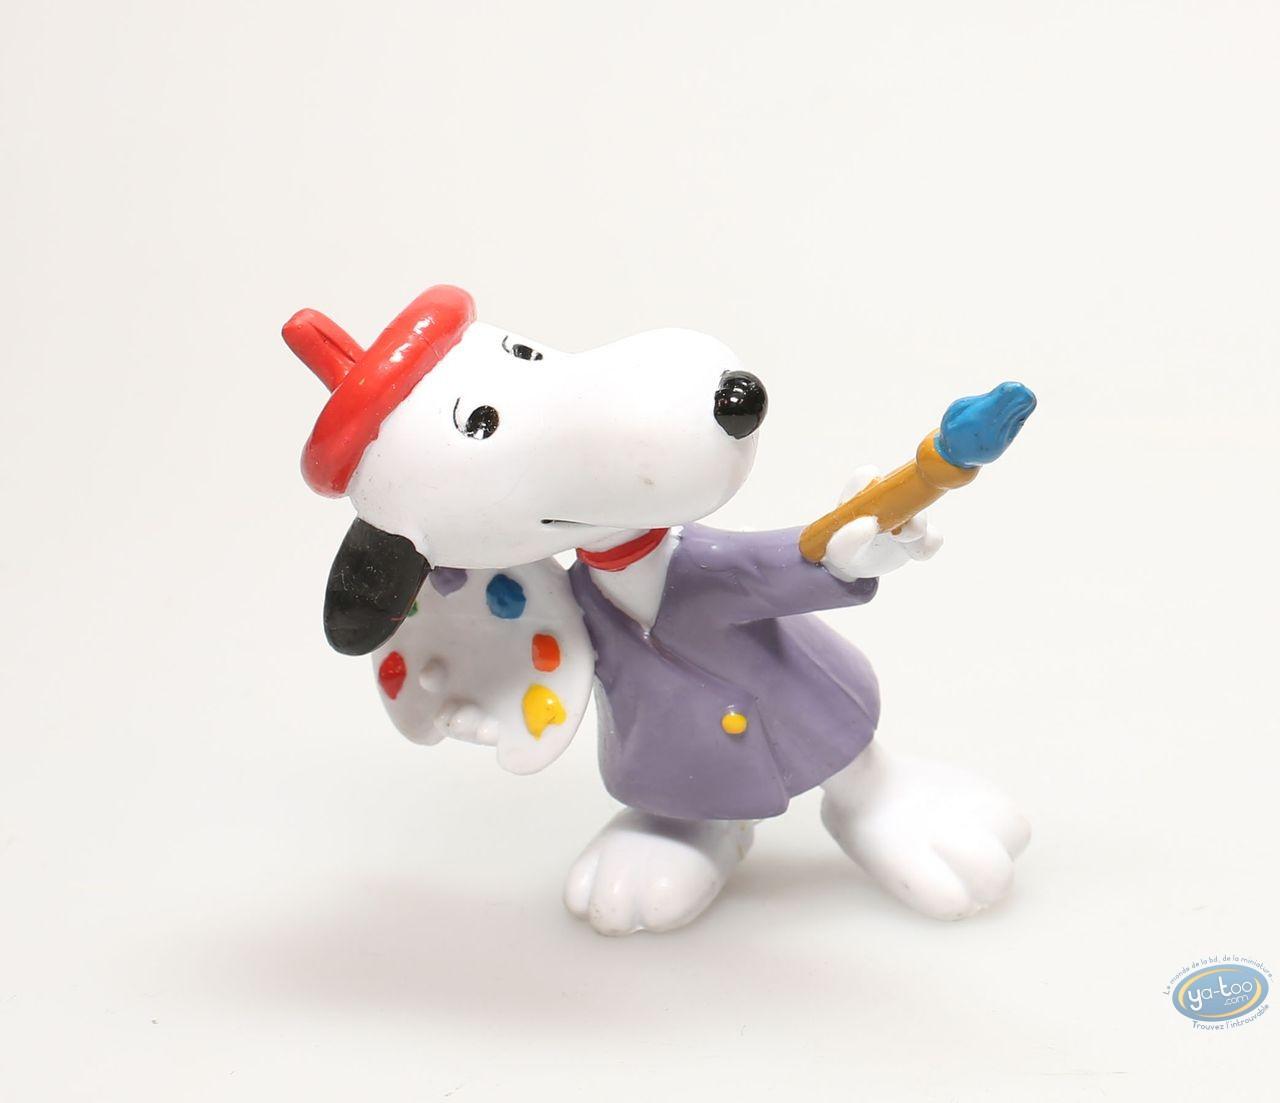 Plastic Figurine, Snoopy : Snoopy painter